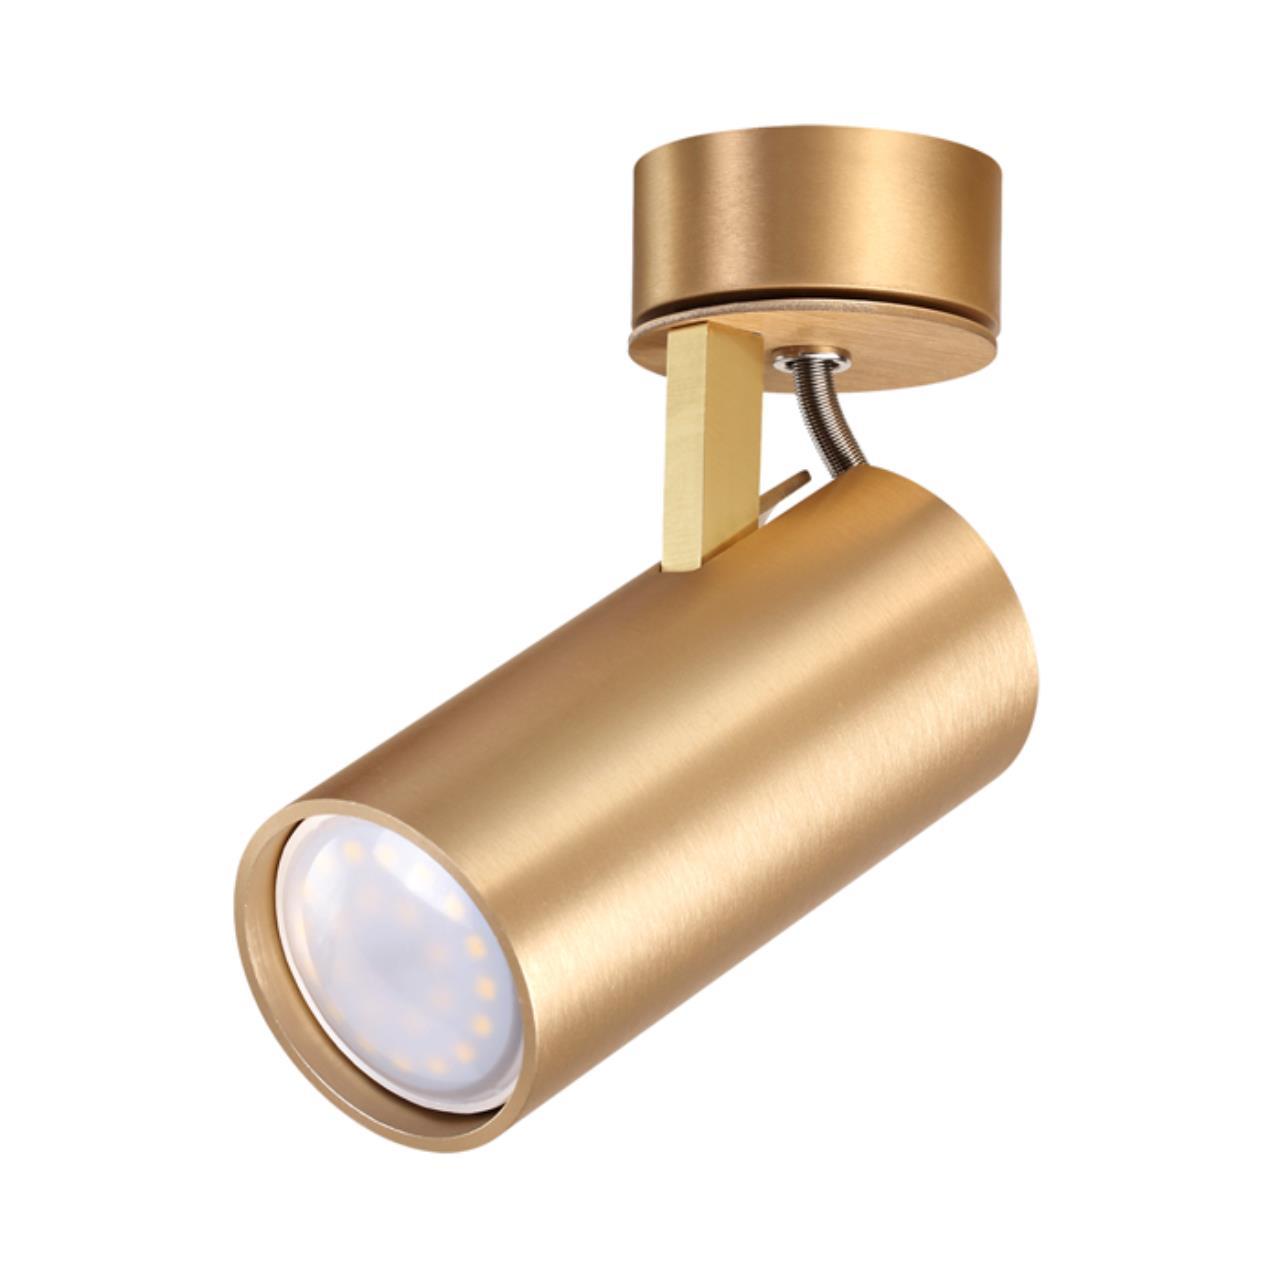 3876/1C HIGHTECH ODL19 215 золотистый Потолочный светильник GU10 1*50W 220V KIKO